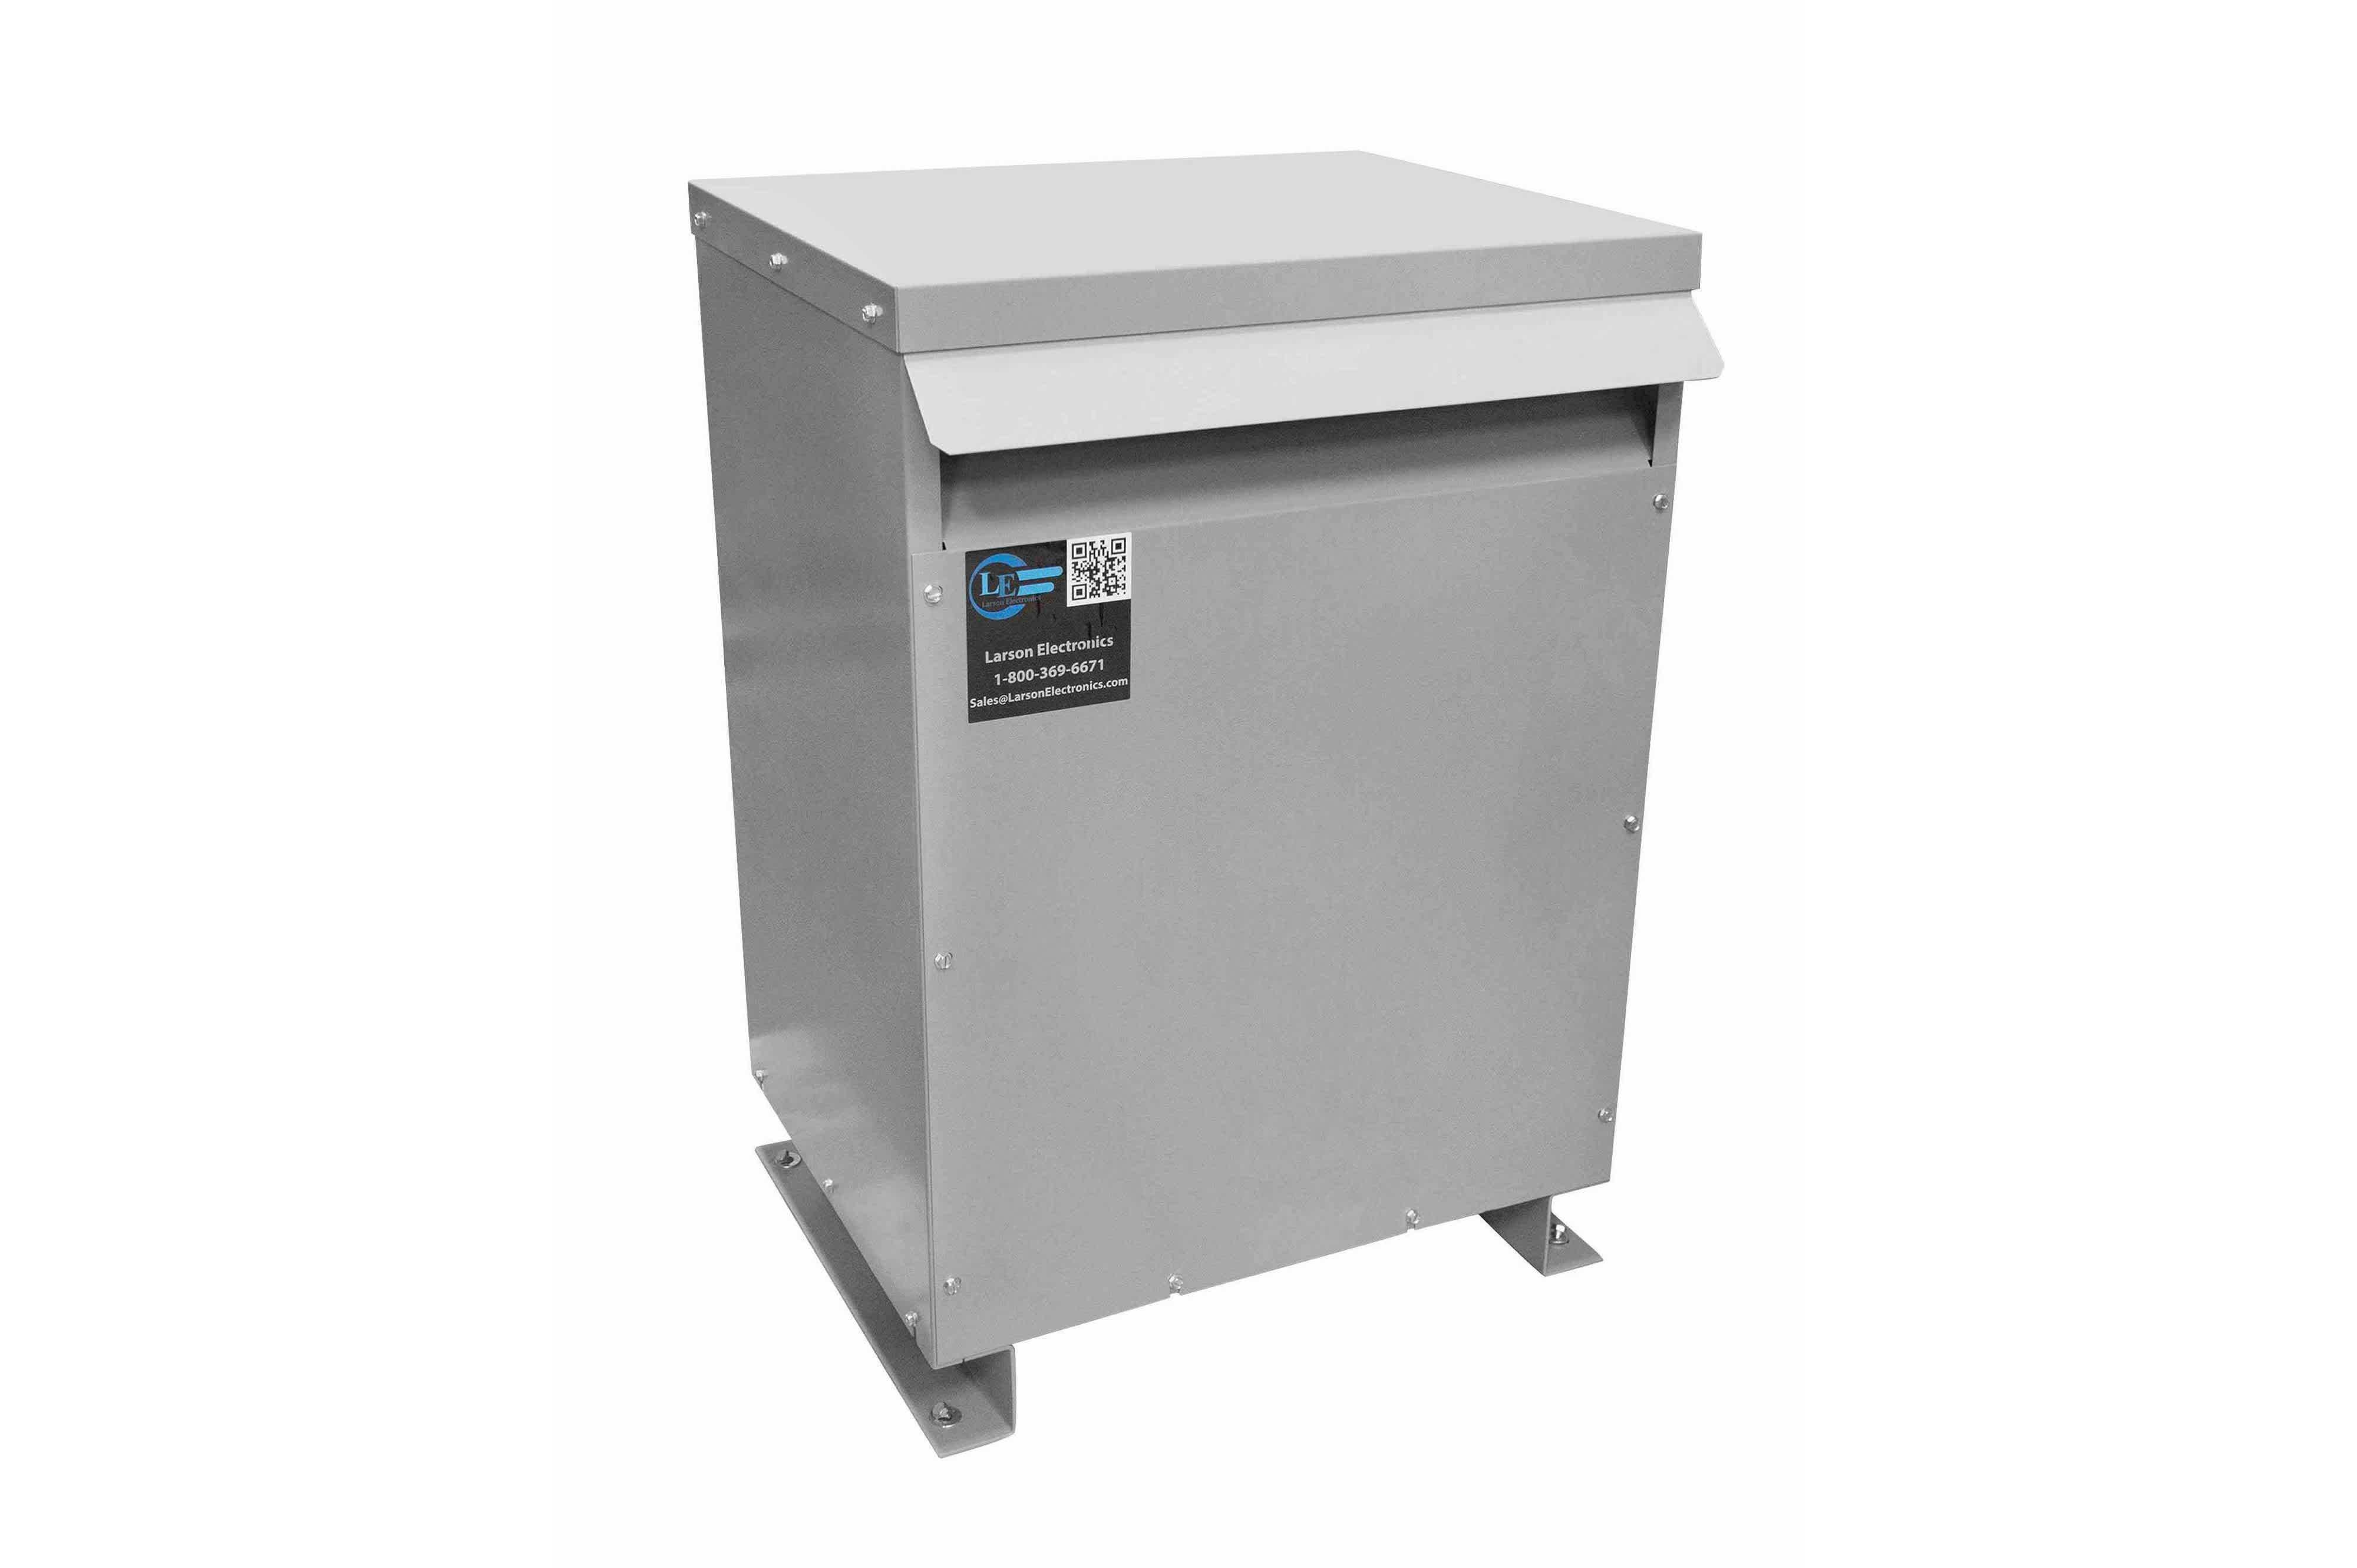 900 kVA 3PH Isolation Transformer, 440V Wye Primary, 240V/120 Delta Secondary, N3R, Ventilated, 60 Hz